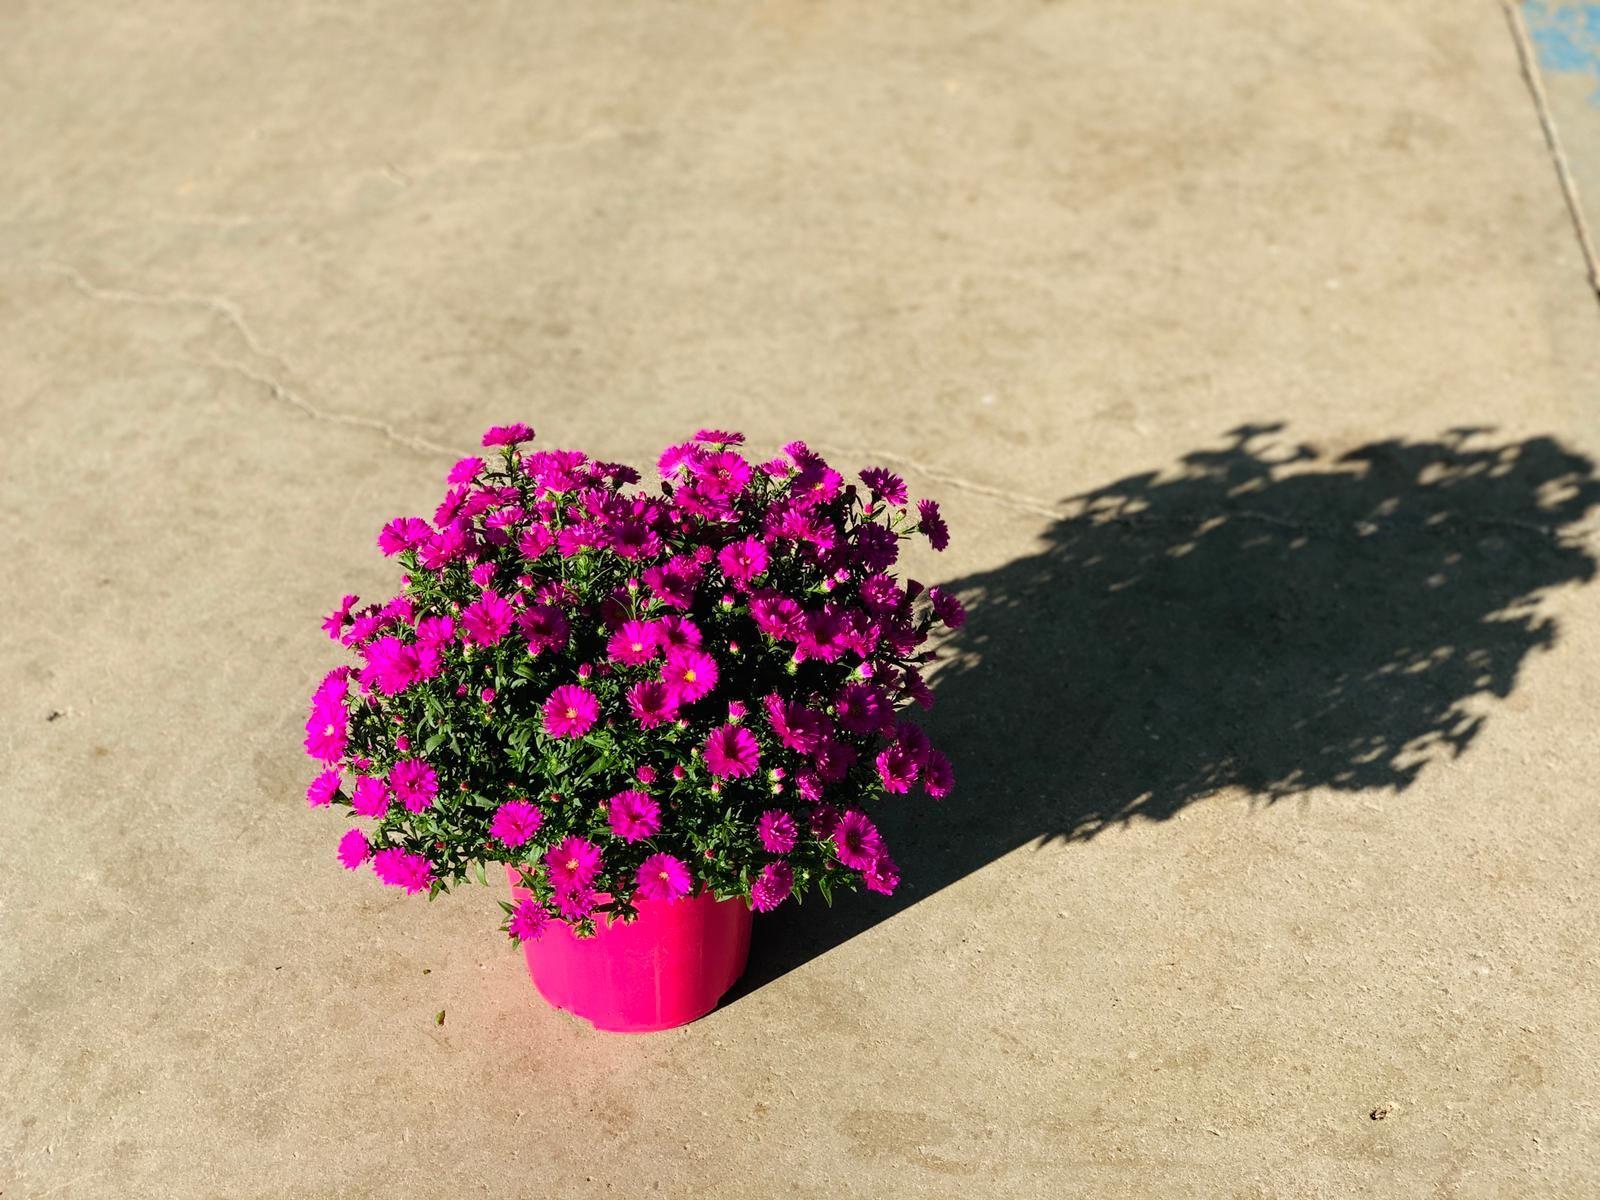 Un nostro follower ci ha scritto che la natura parla con l'anima... ne siamo assolutamente certi... . 🇬🇧 One of our followers wrote us that nature speaks to the soul ... we are absolutely certain ... . #nature #purpleflowers #iloveflowers #beautifulflowers #best_beauty_flora_ #floweraddict #flowershot #flowermagic #flowersofinstagram #instagardenlovers #instaflower #myflowers #mygarden #macroflower #asterflower #flowersoftheworld #flowerperfection ##aster #gagliolofactory #albenga #italy